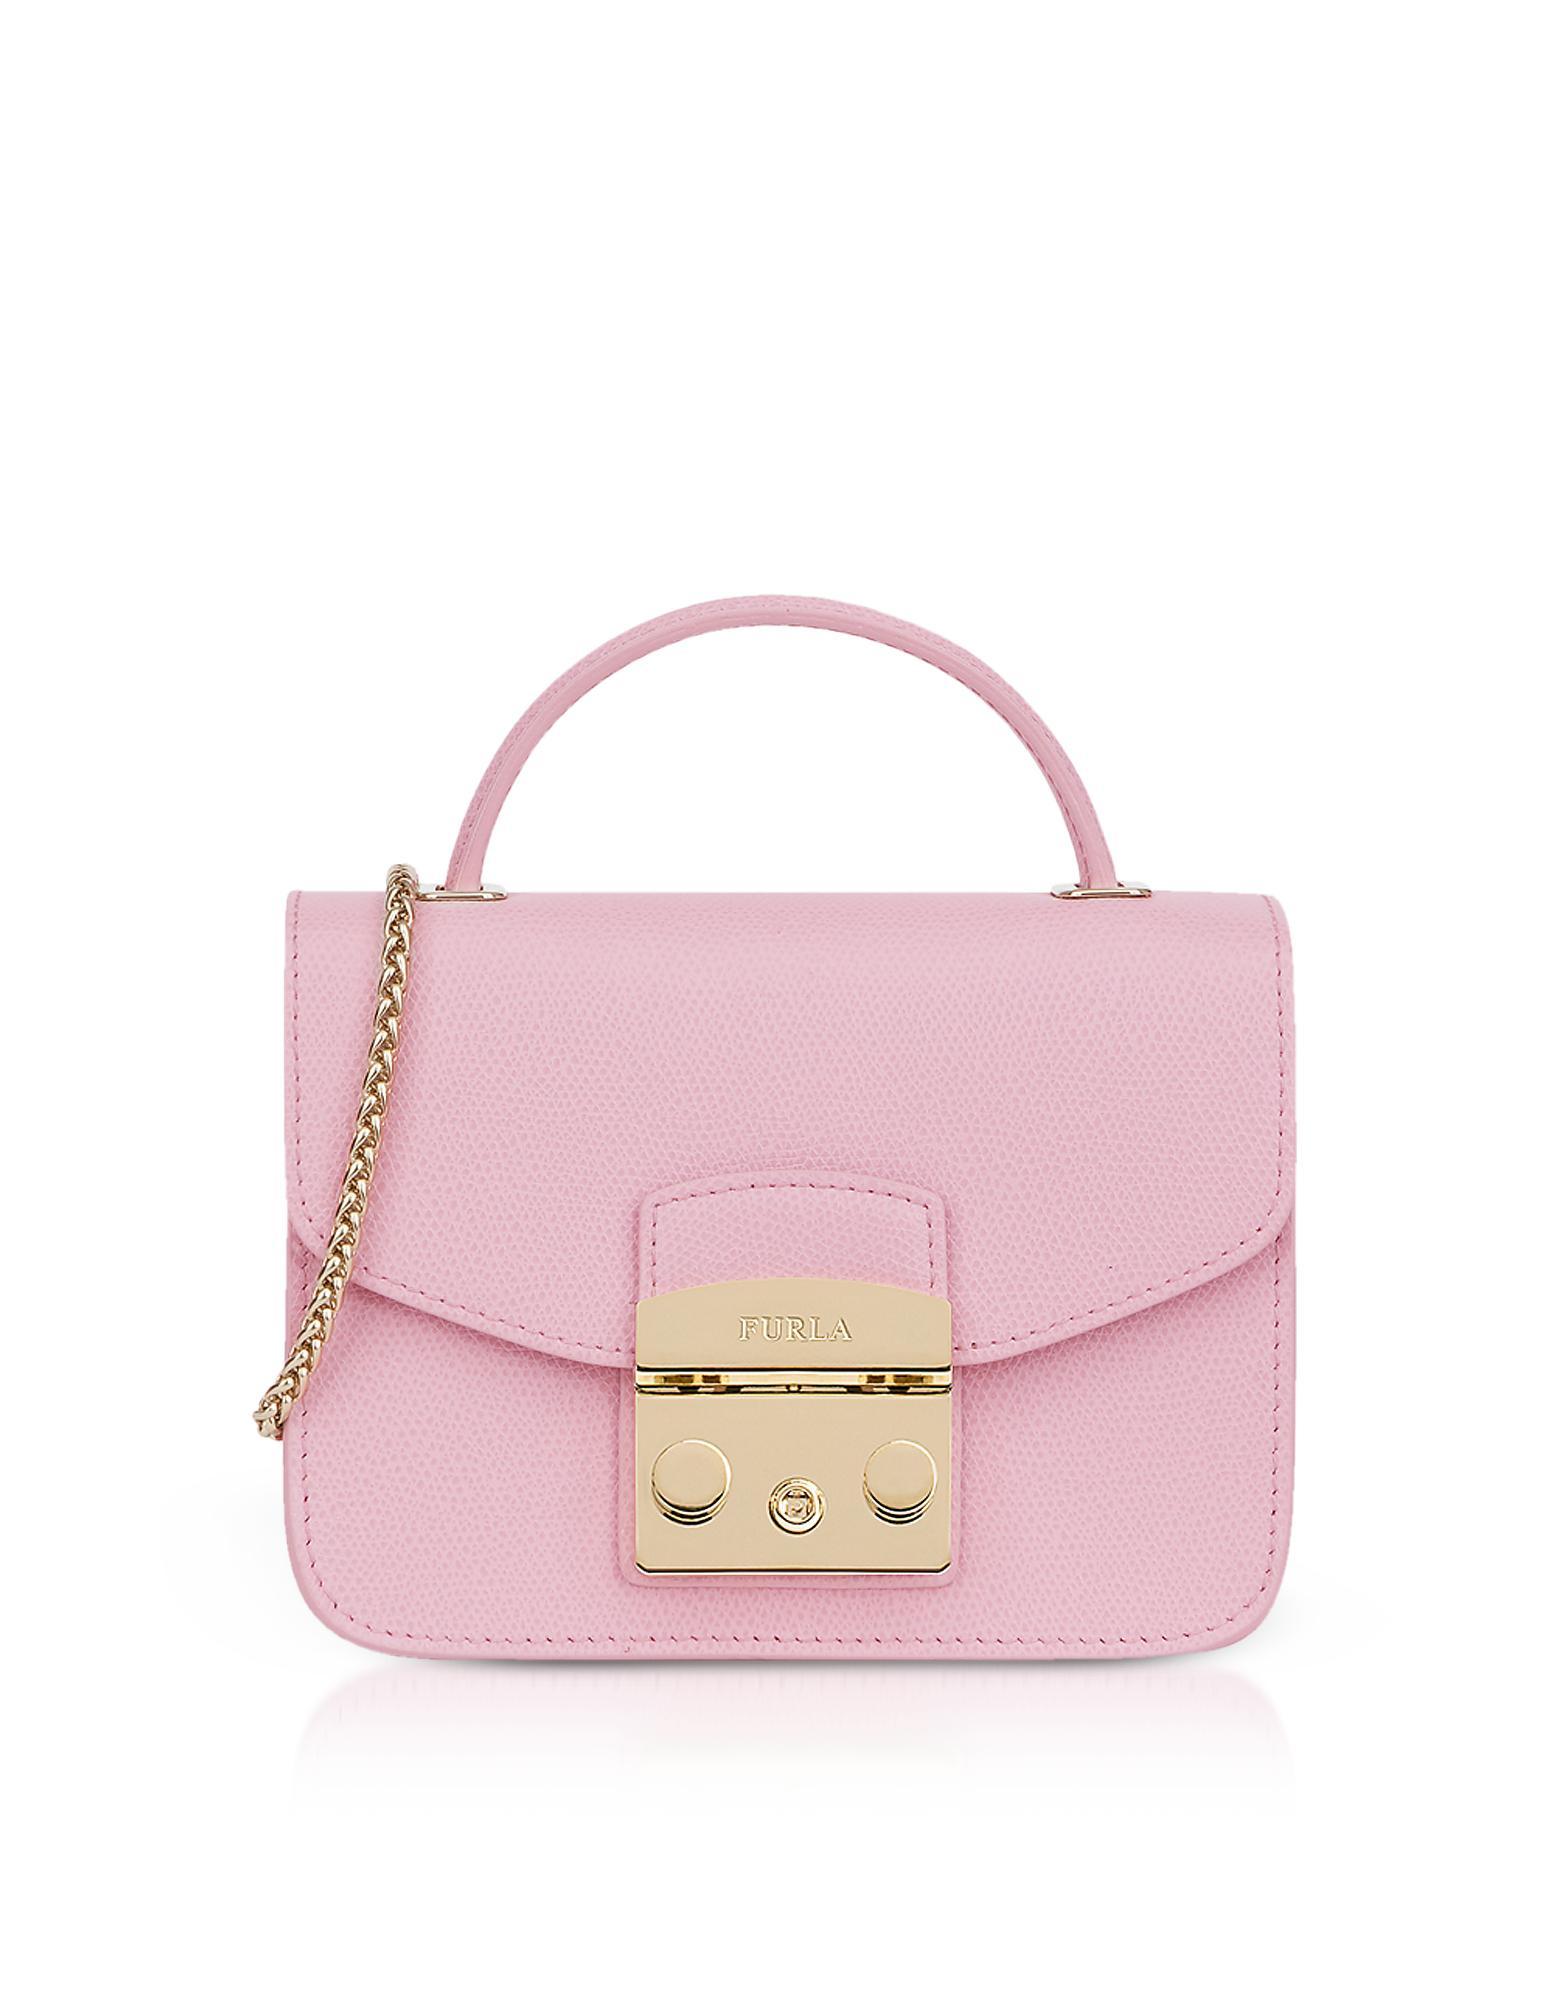 fbe6aab2cfee Furla - Pink Metropolis Mini Top Handle Crossbody Bag - Lyst. View  fullscreen